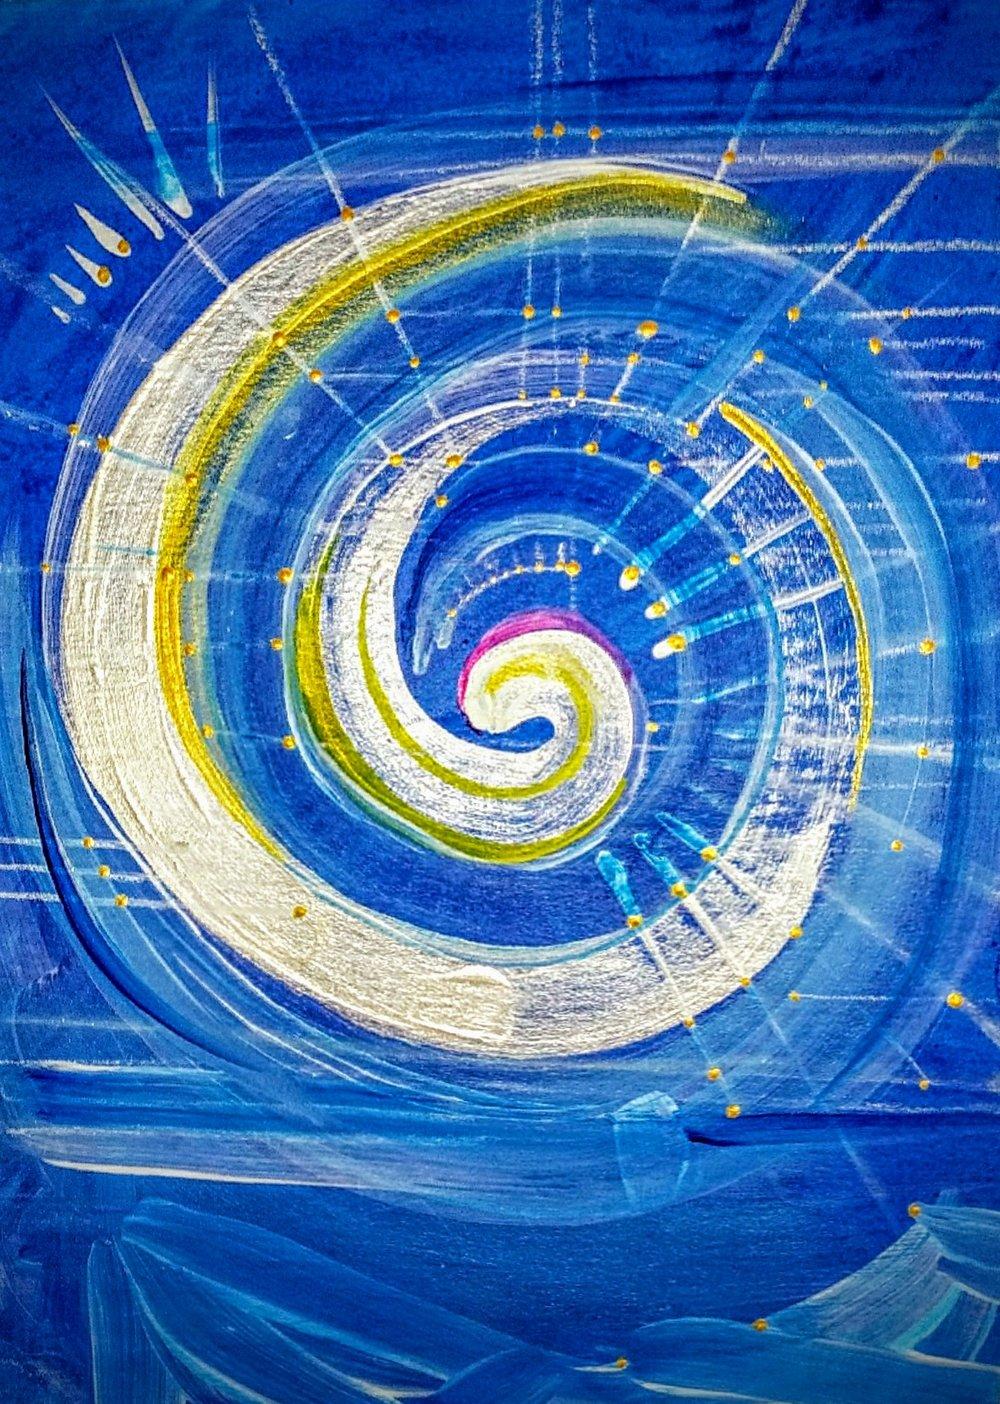 Integration Spiral 7-26-17.jpg